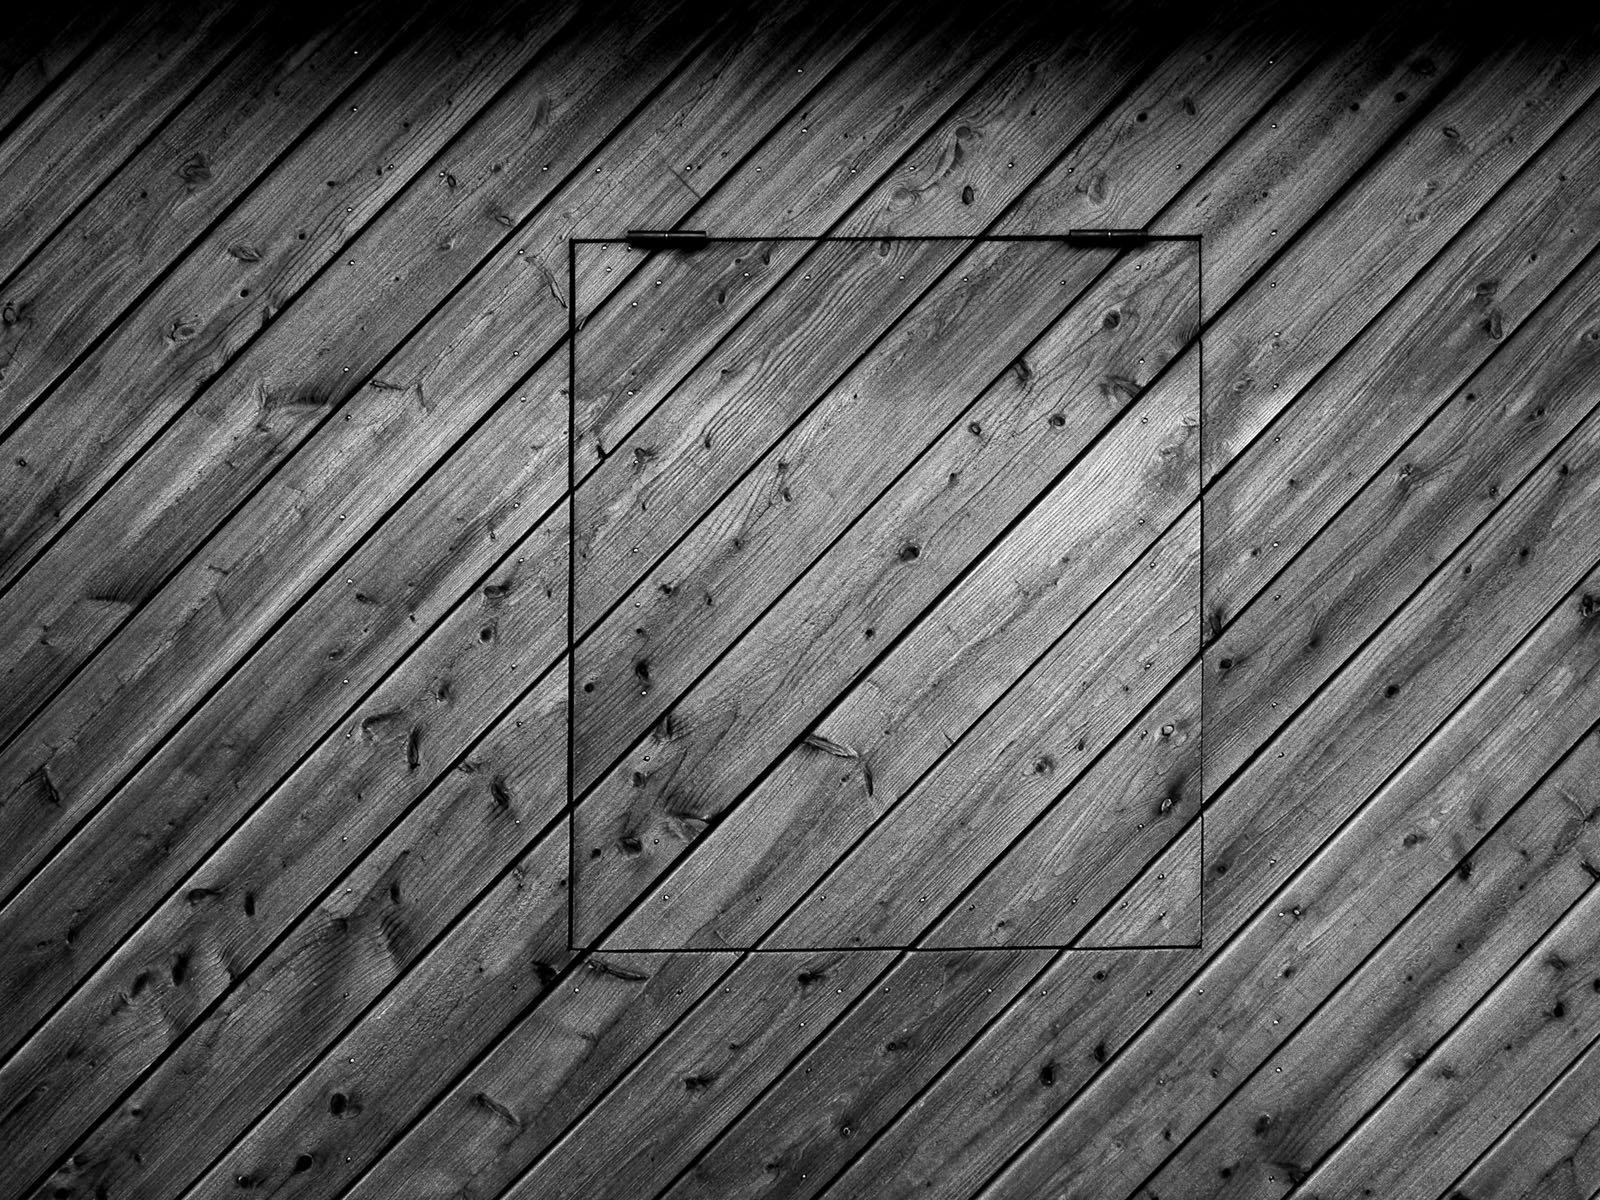 free texture du bois 2 stock photo. Black Bedroom Furniture Sets. Home Design Ideas